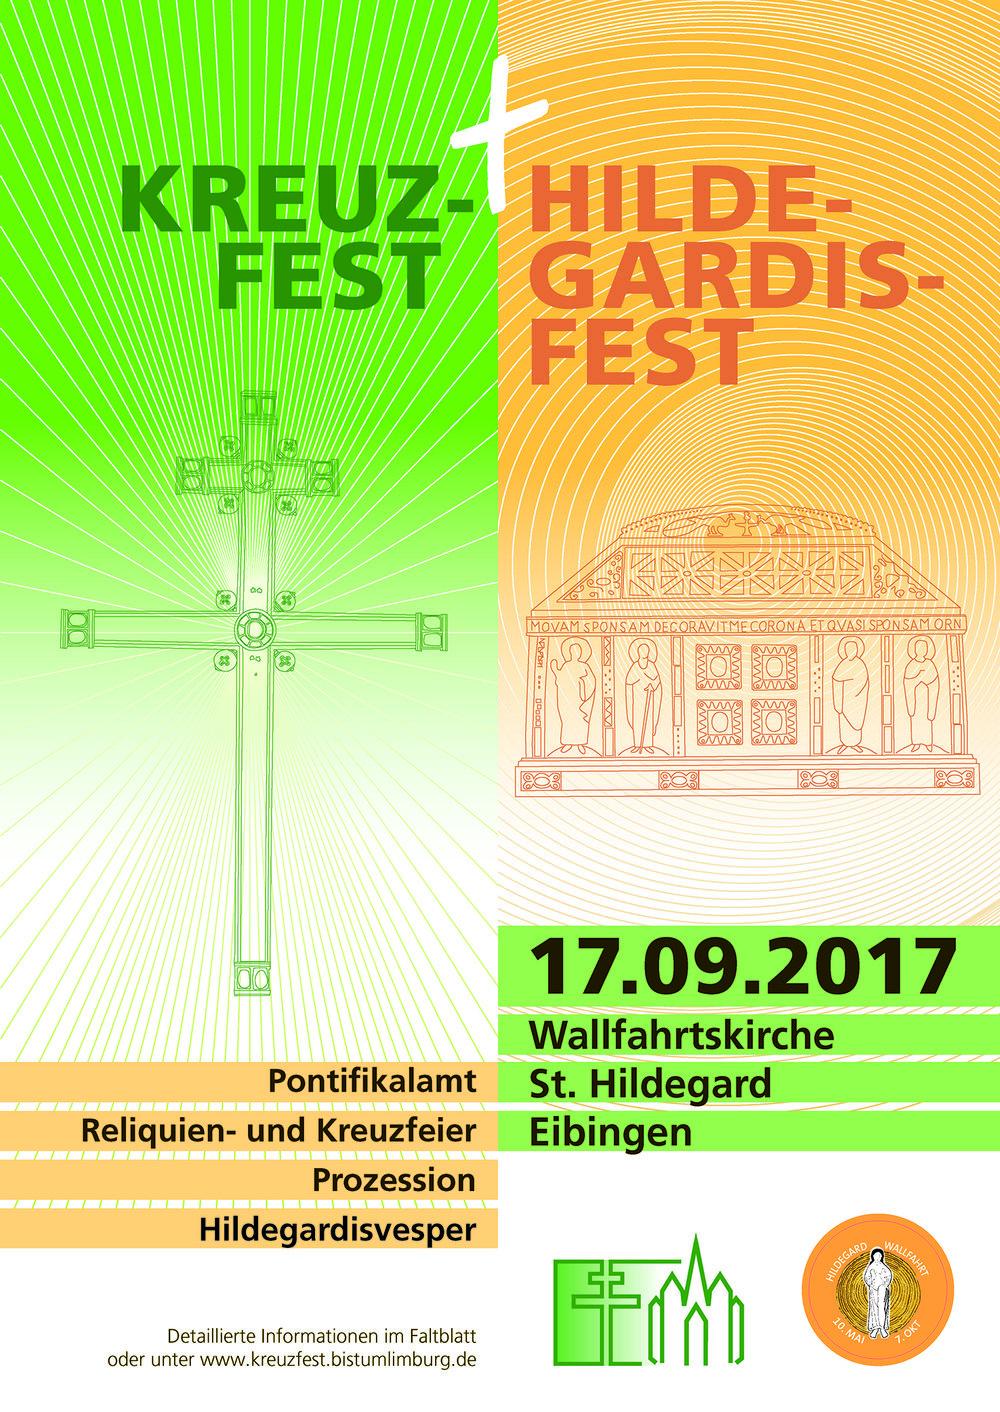 Plakat_Kreuzfest_Hildegardisfest.jpg